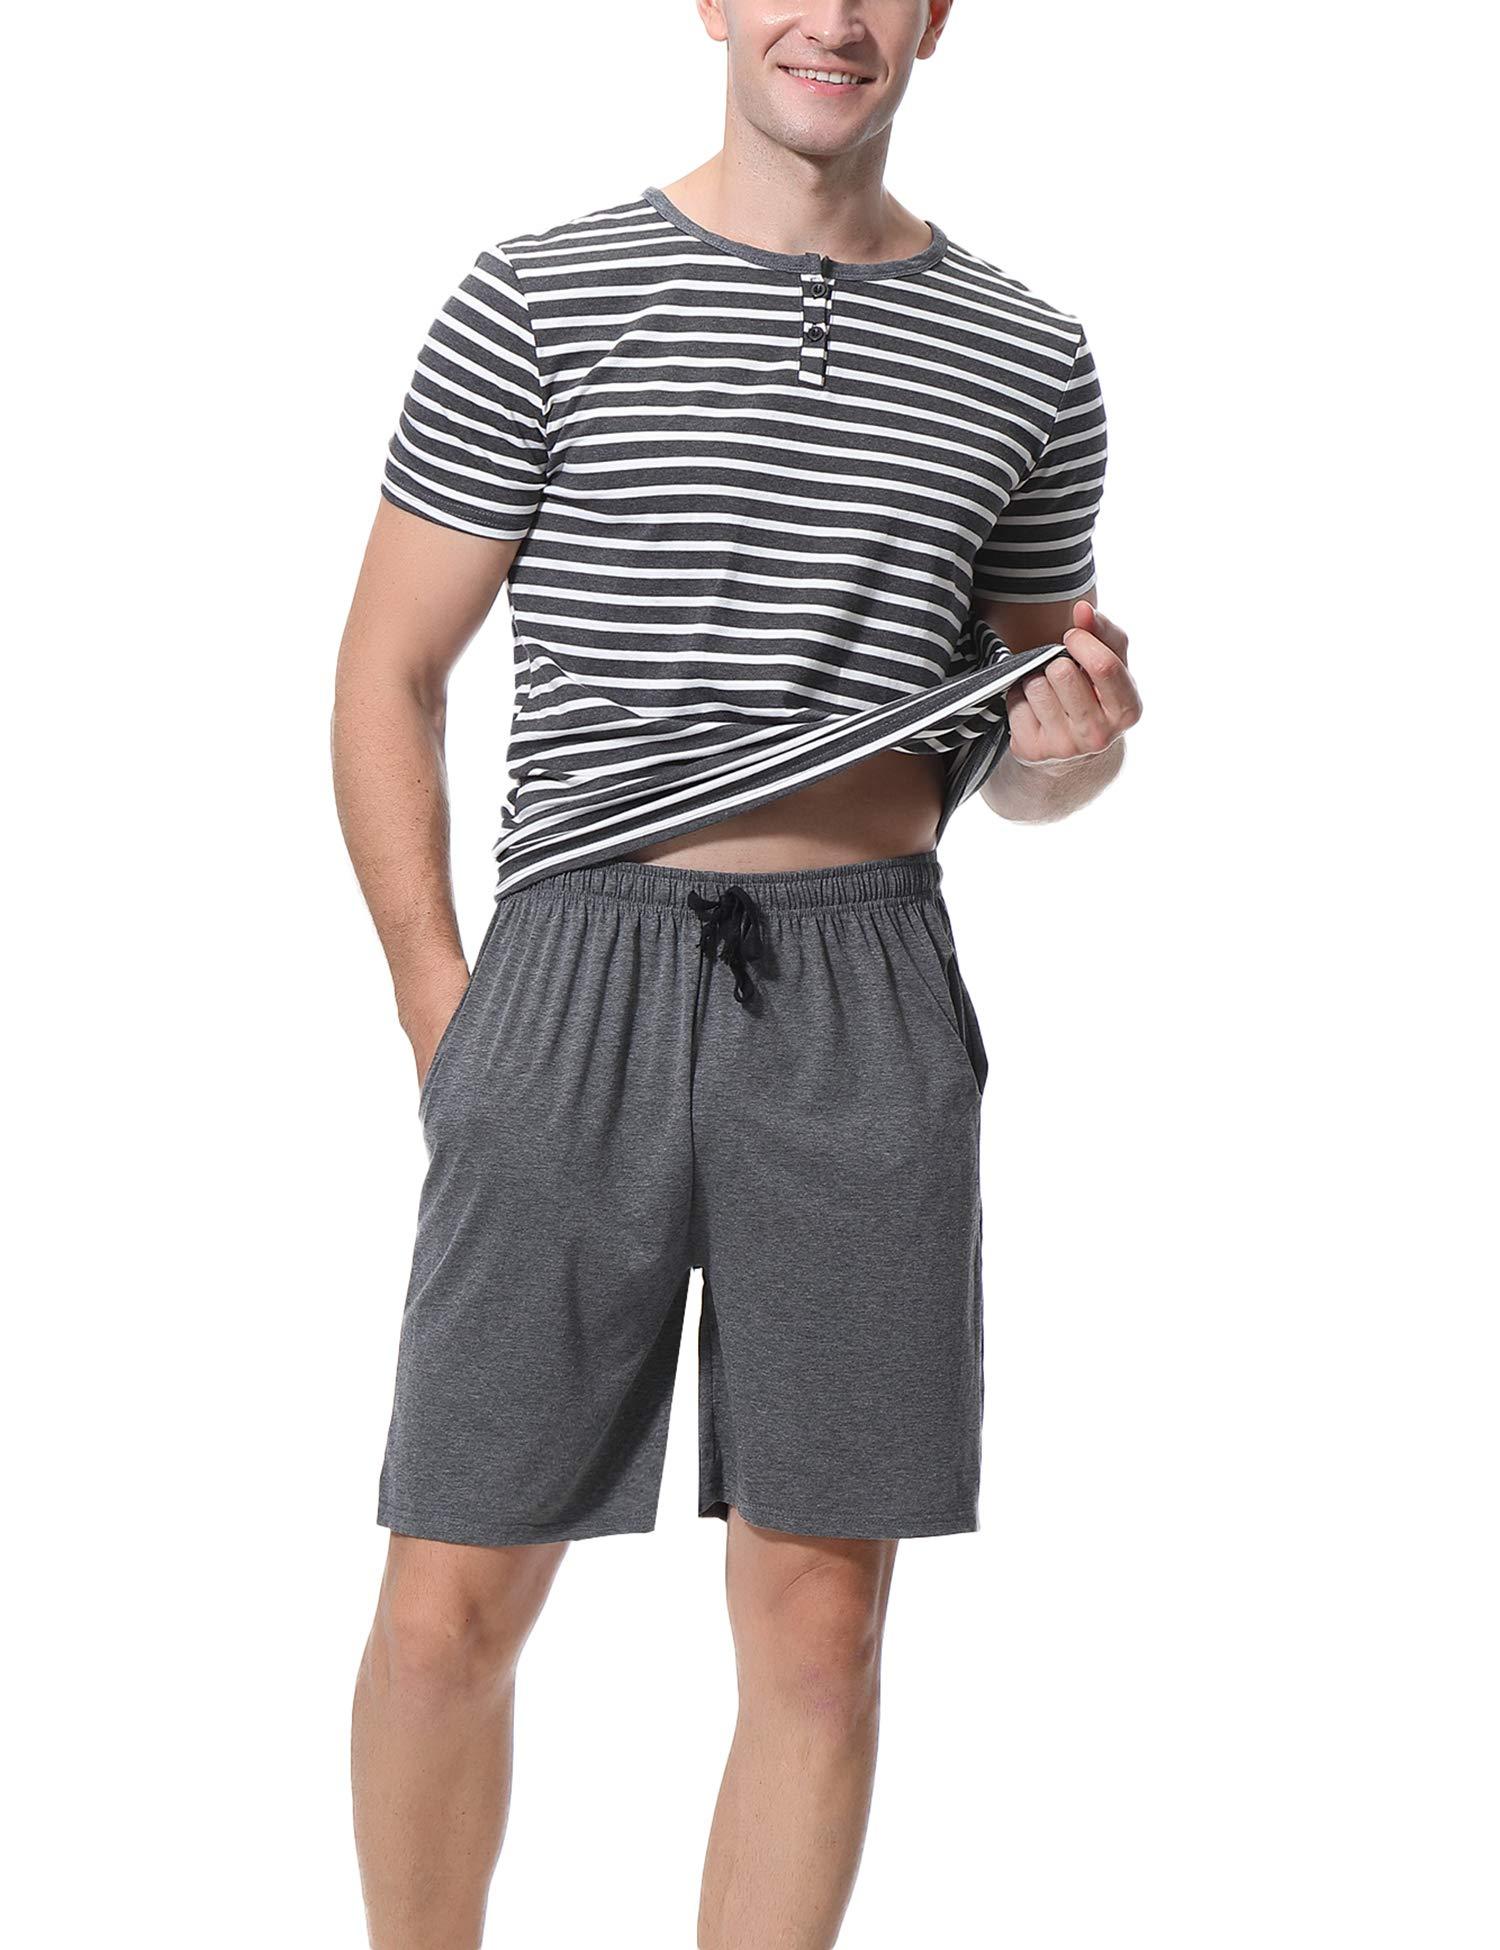 Forex en pijama opiniones